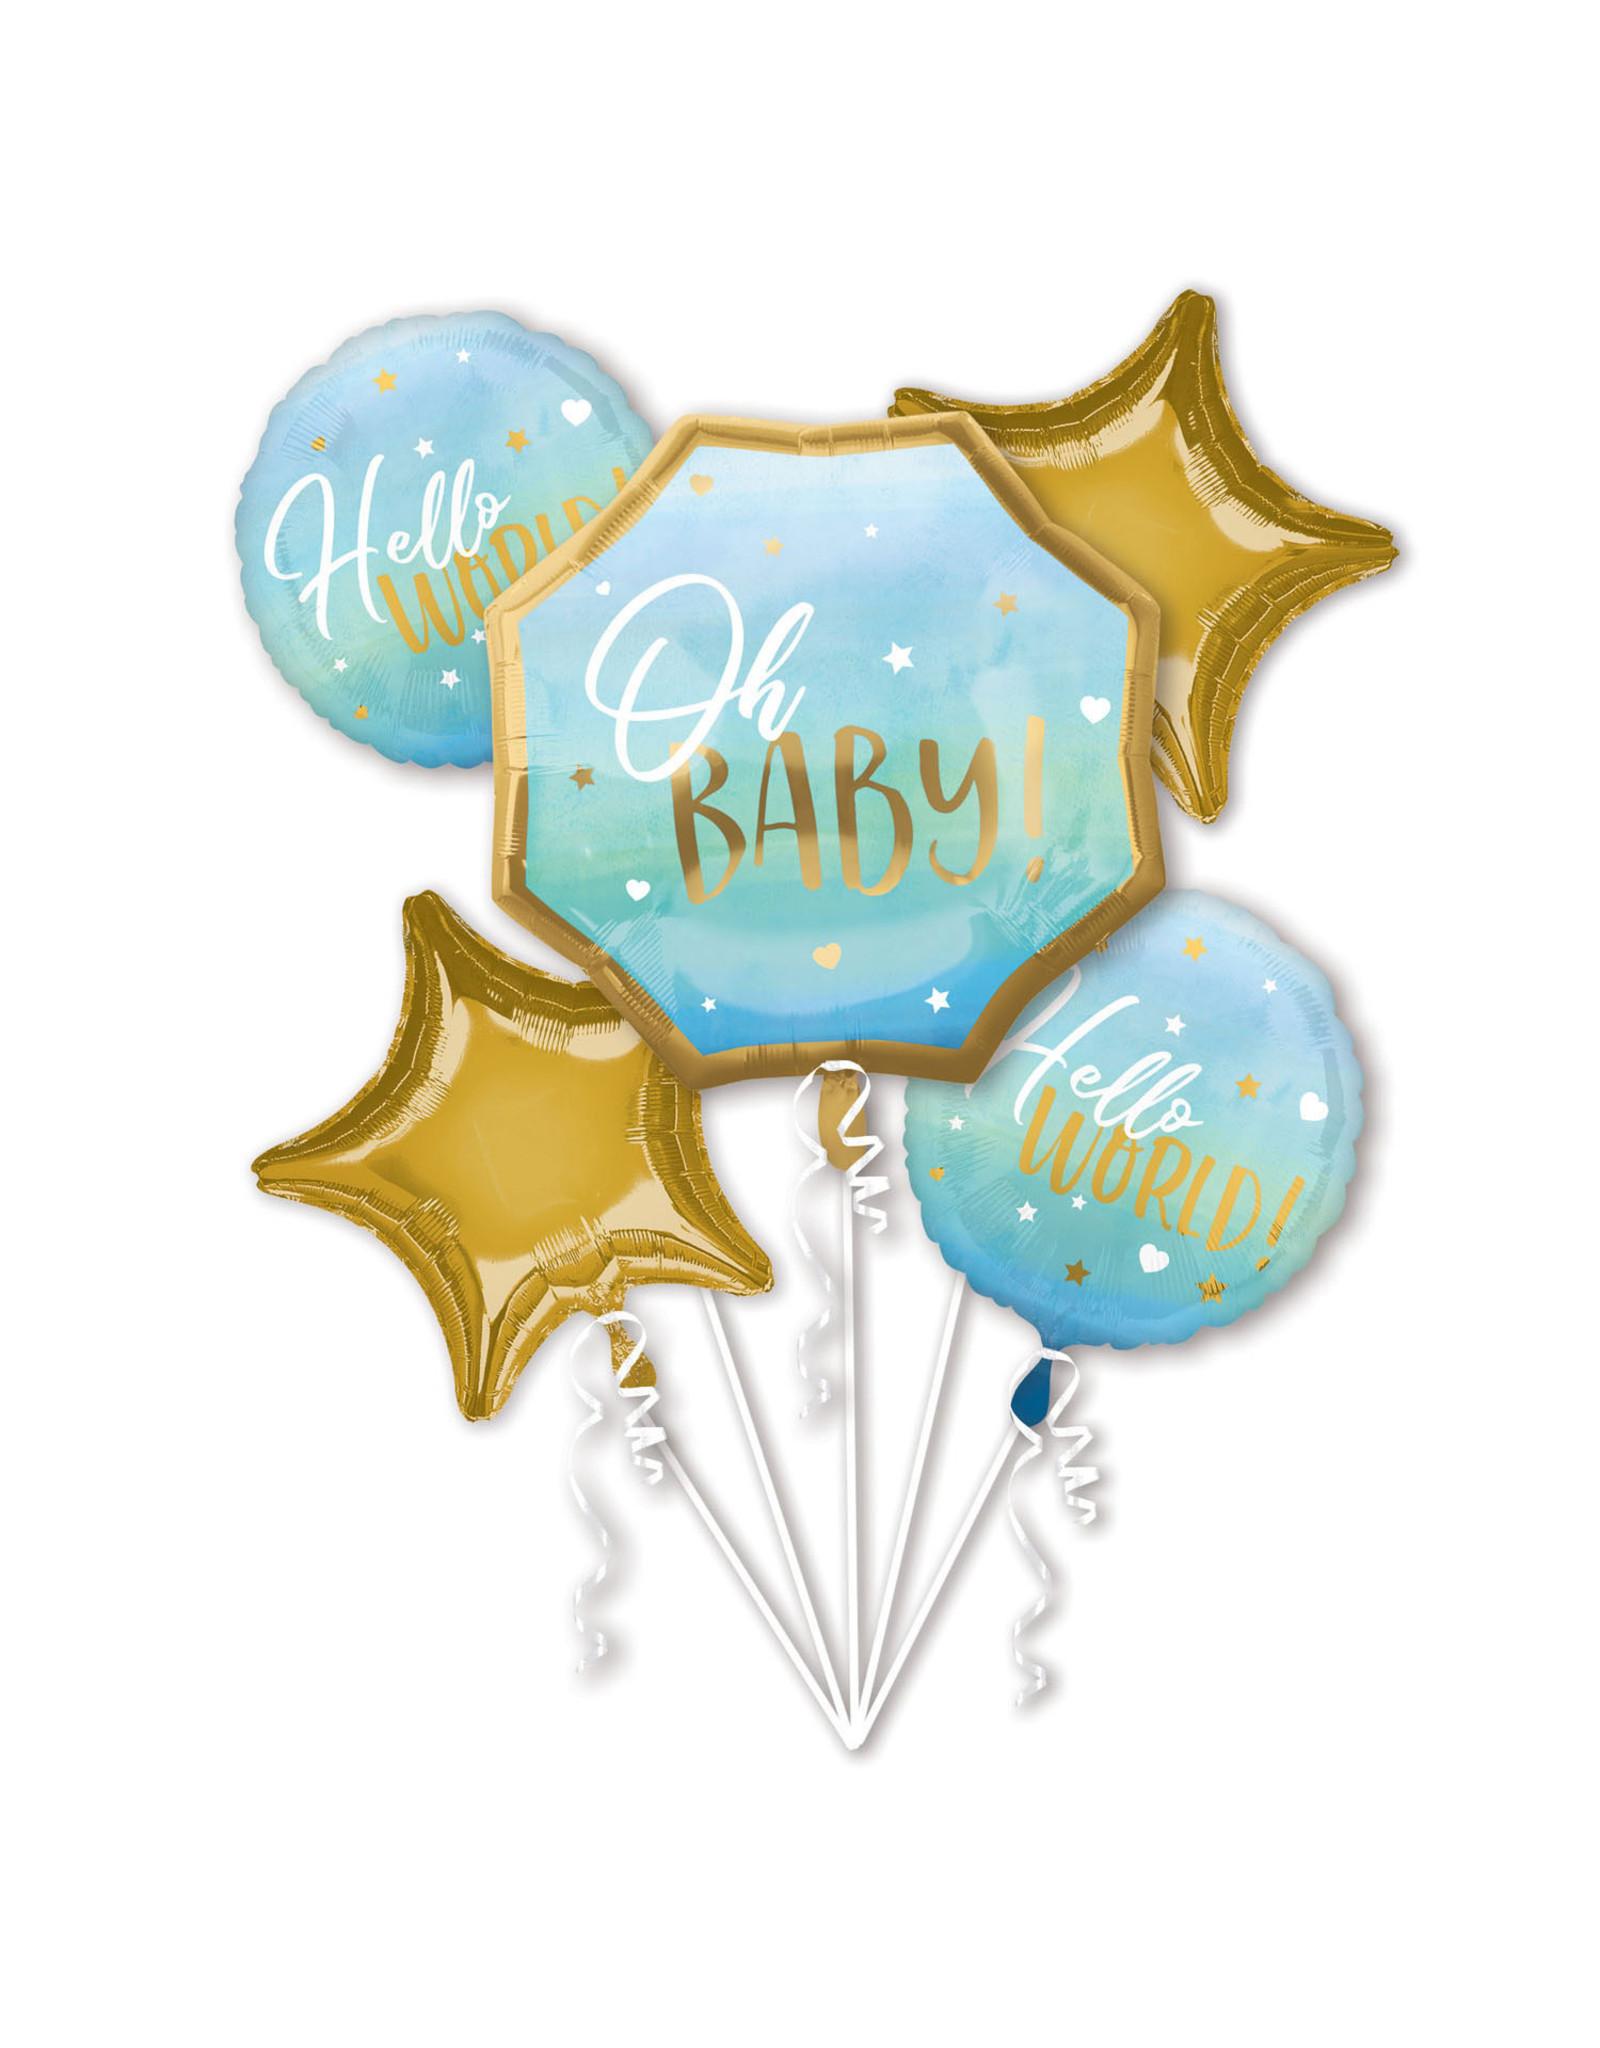 Amscan folieballonpakket OH BABY! Blauw/goud 5-delig